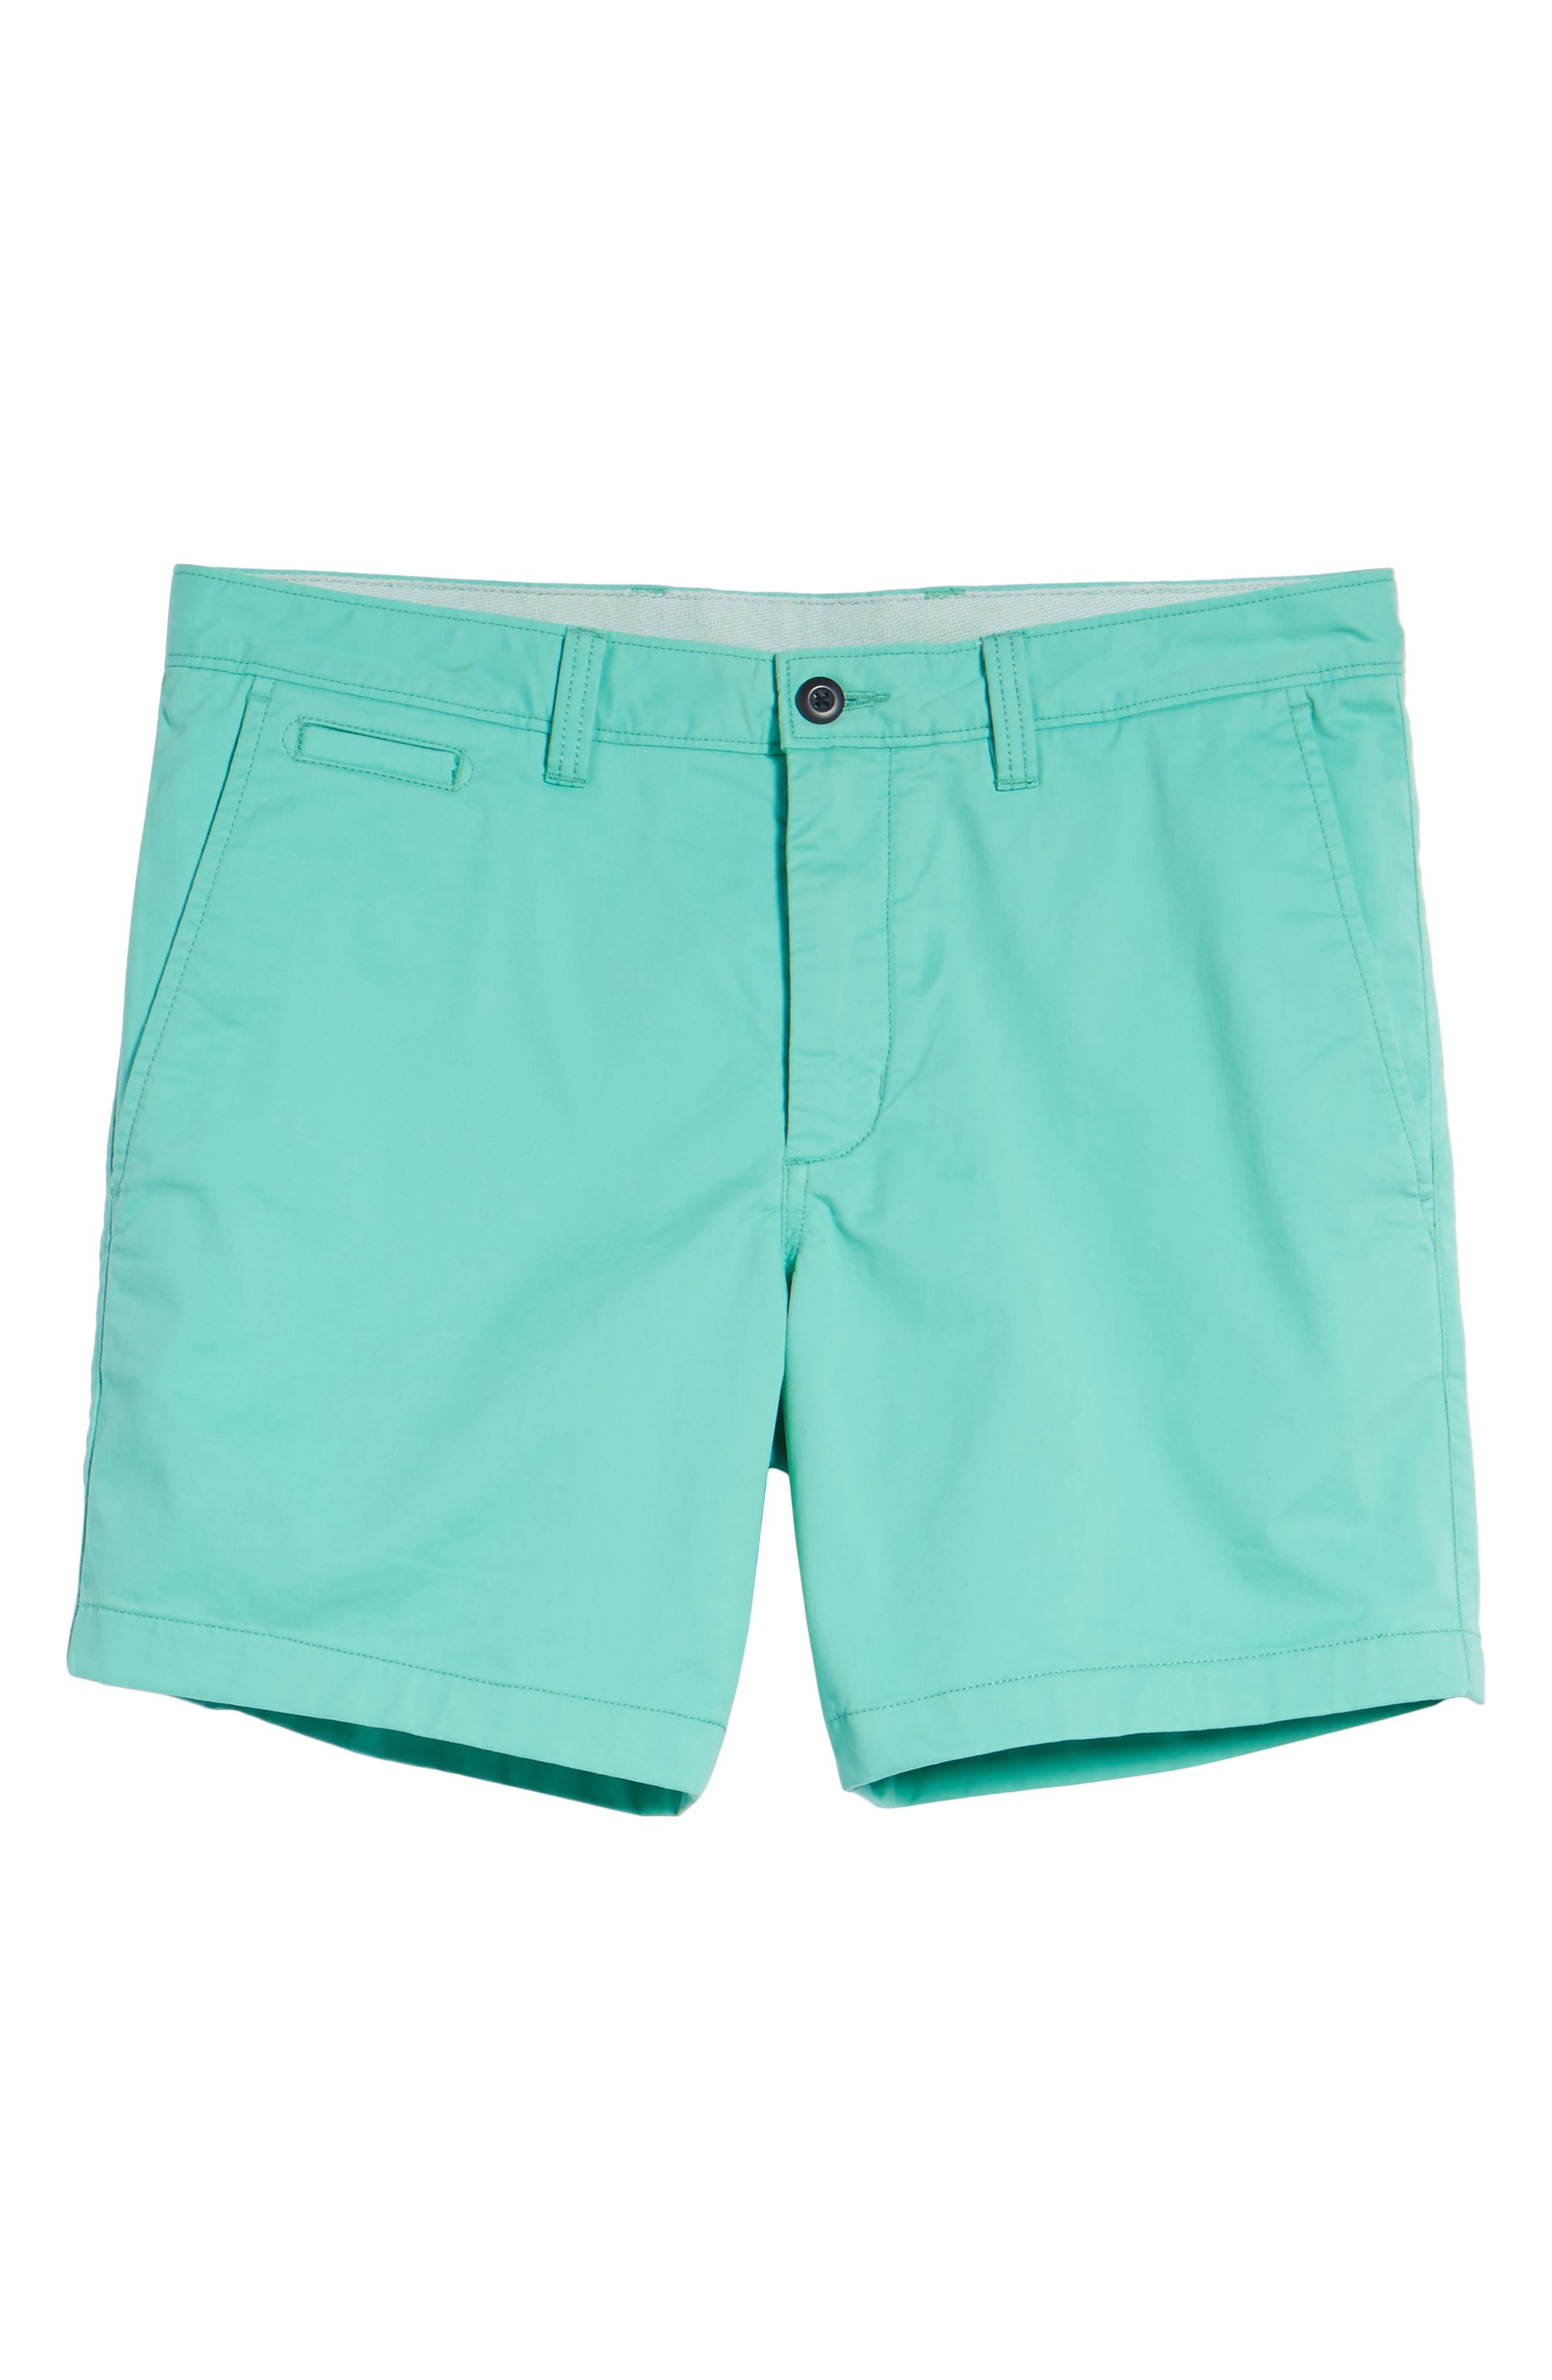 Ballard Slim Fit Stretch Chino 7-Inch Shorts,                             Alternate thumbnail 66, color,